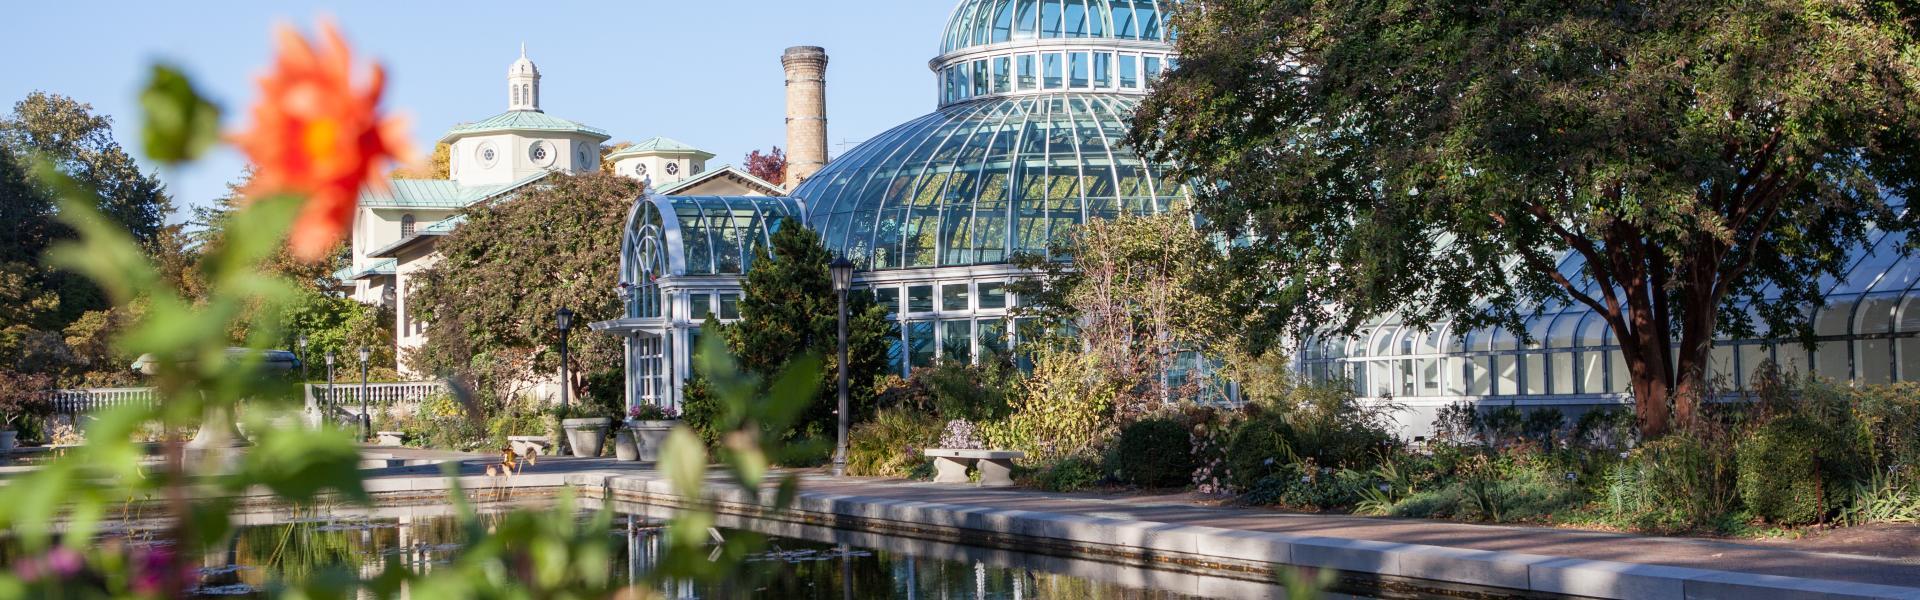 Brooklyn Botanic Garden, Greenhouse, Pond